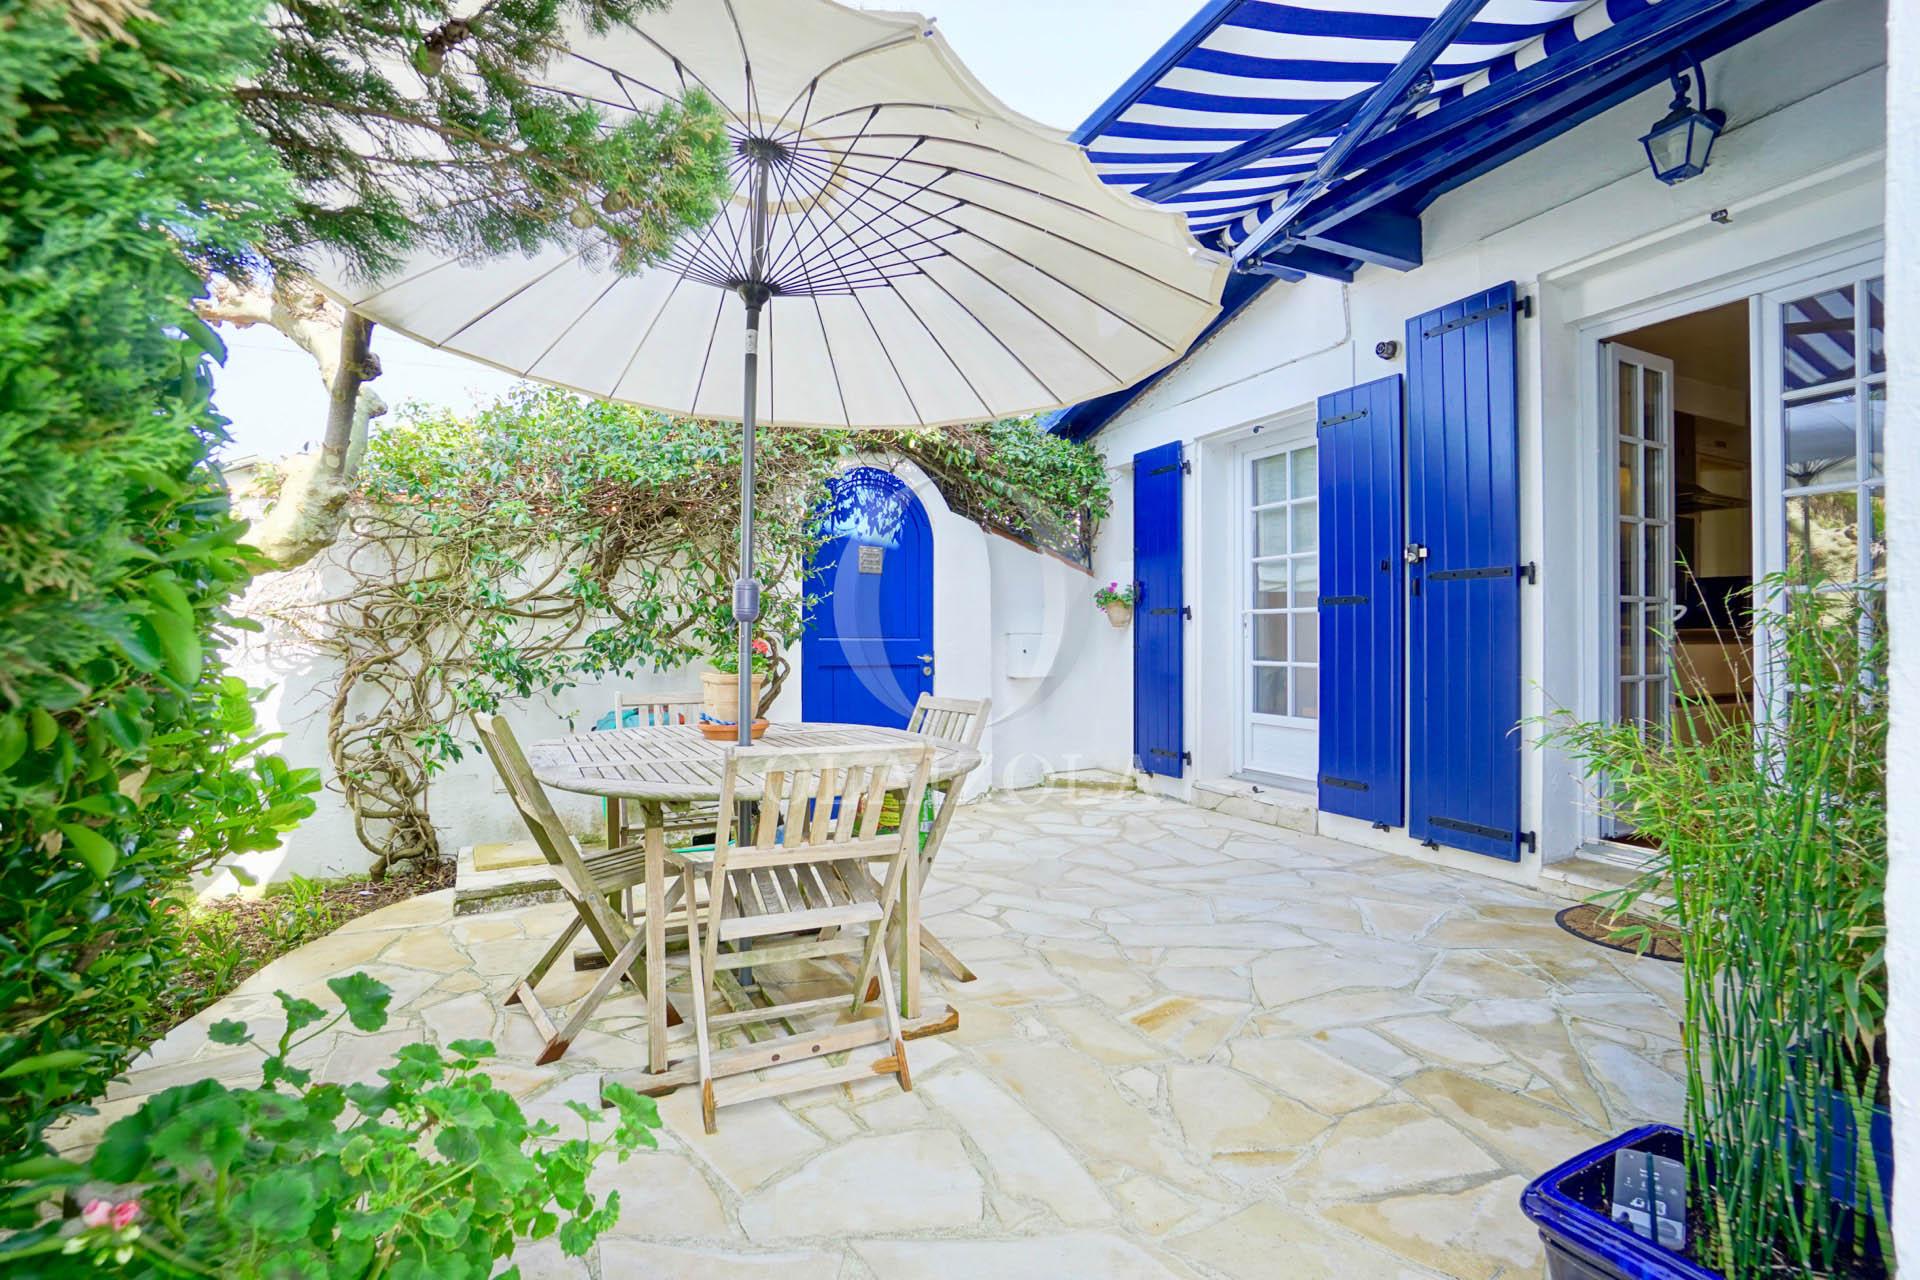 Vacances biarritz un choix unique de locations de for Piscine ustaritz